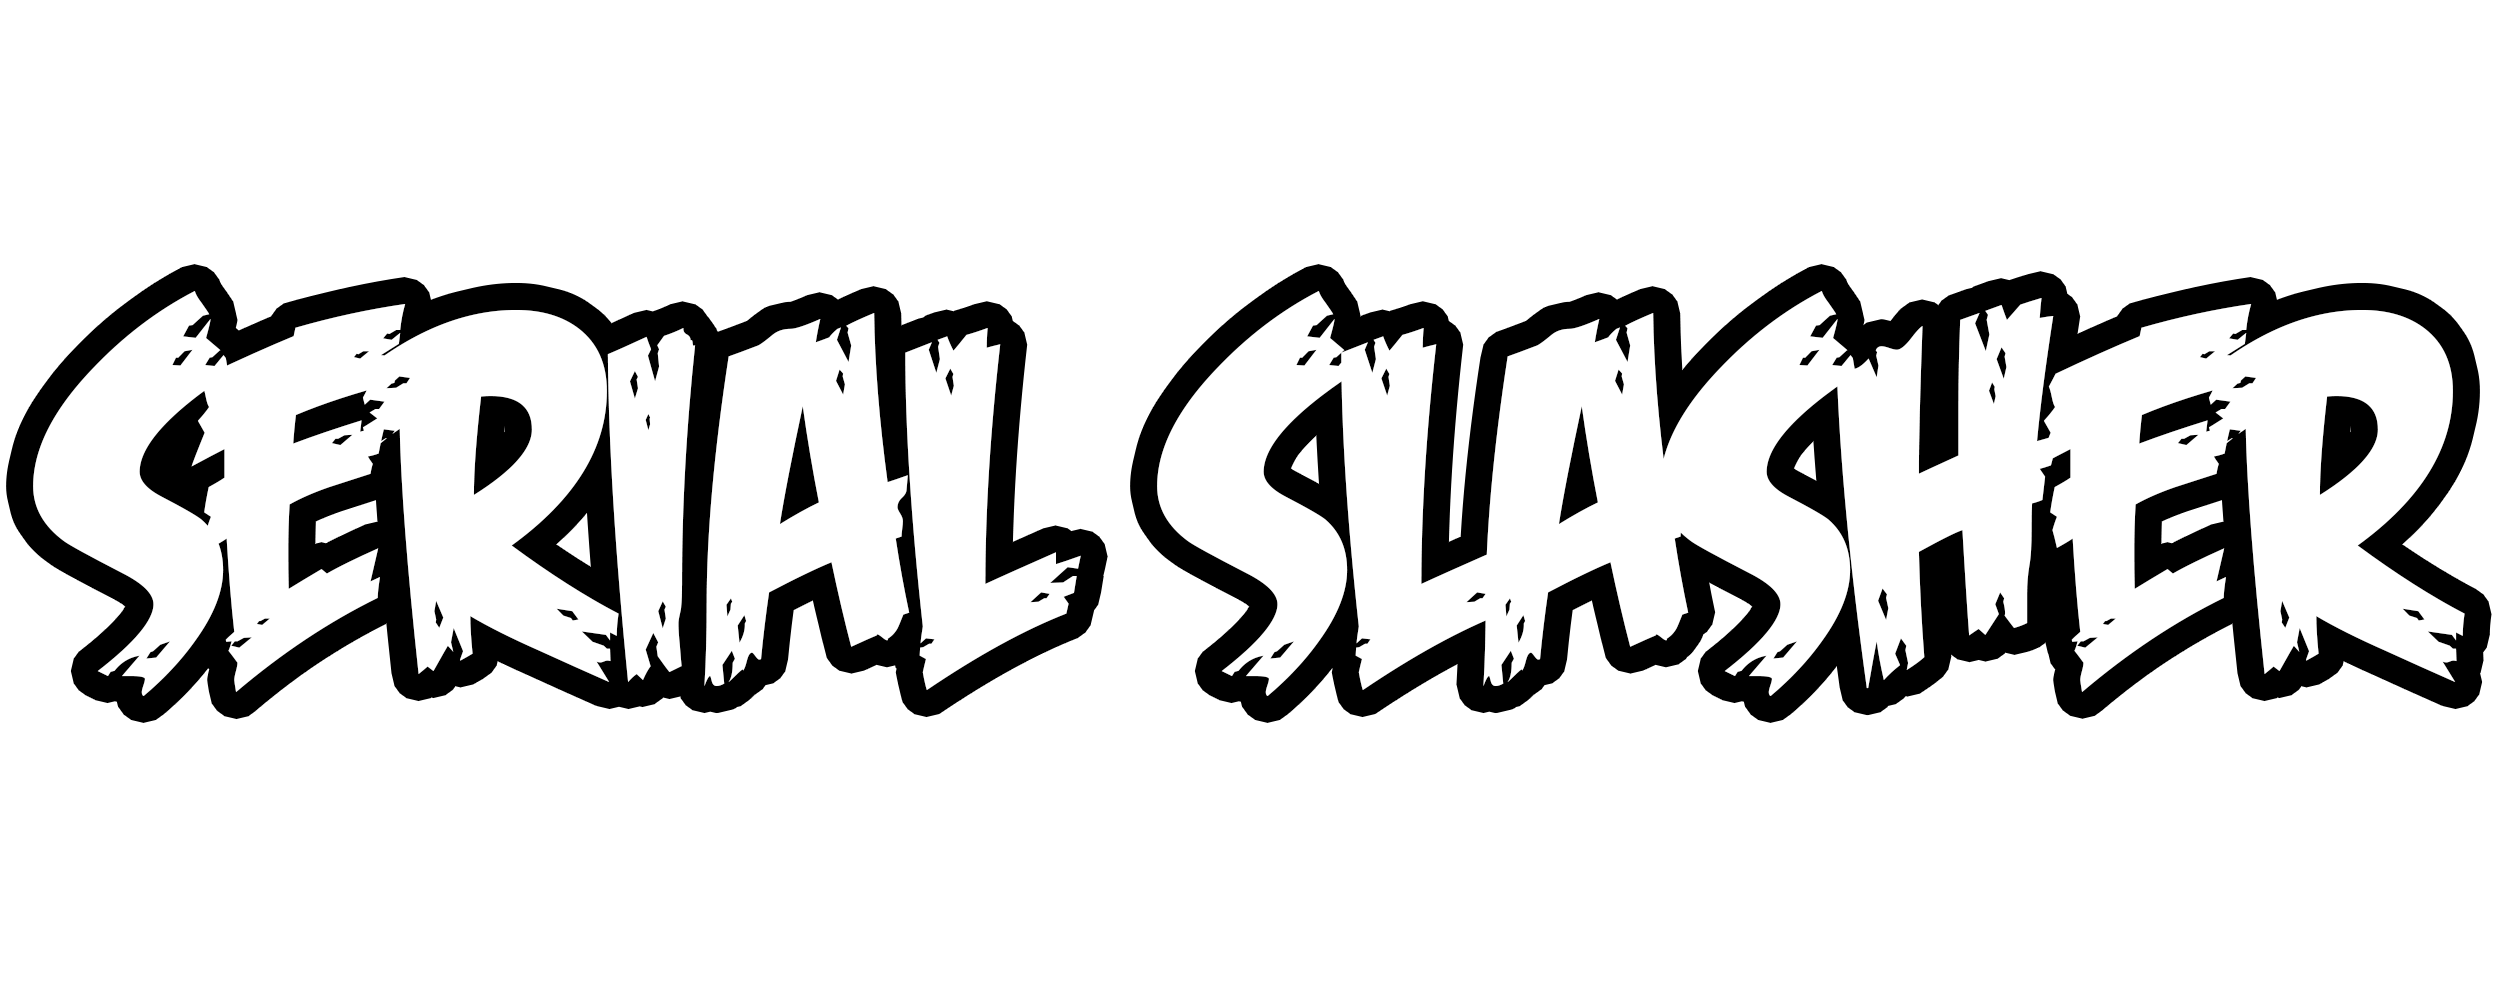 Serial Slasher